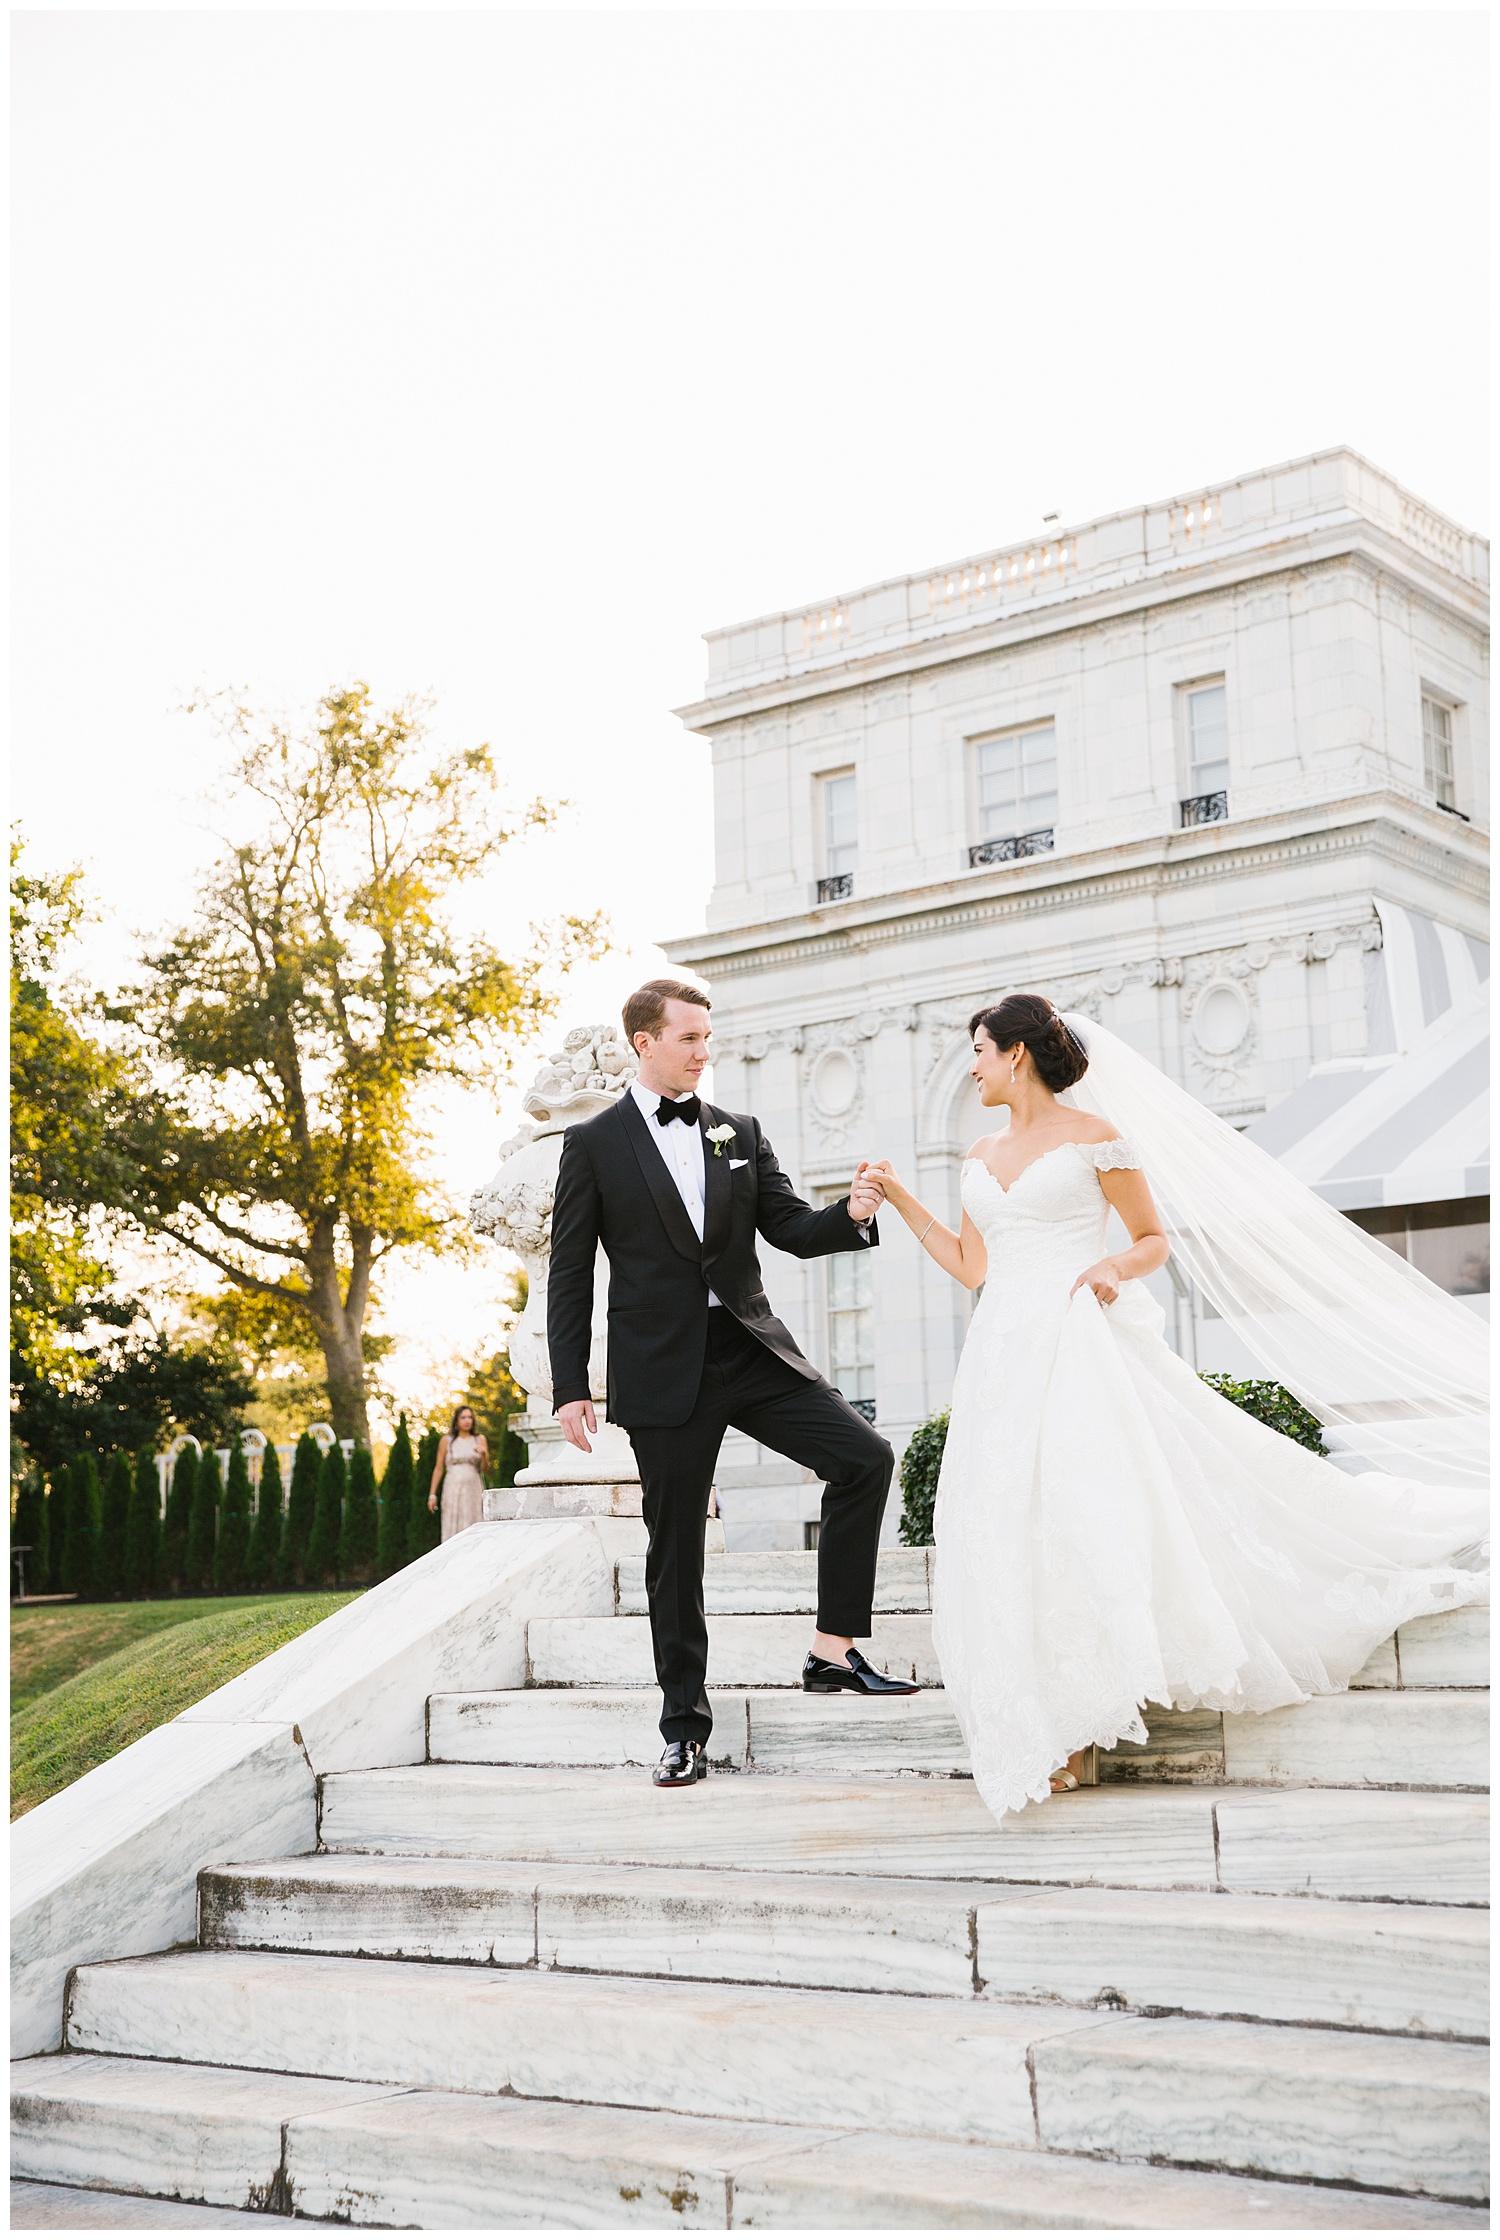 Stephen_Nathalie_Rosecliff_Mansion_Wedding_020.jpeg